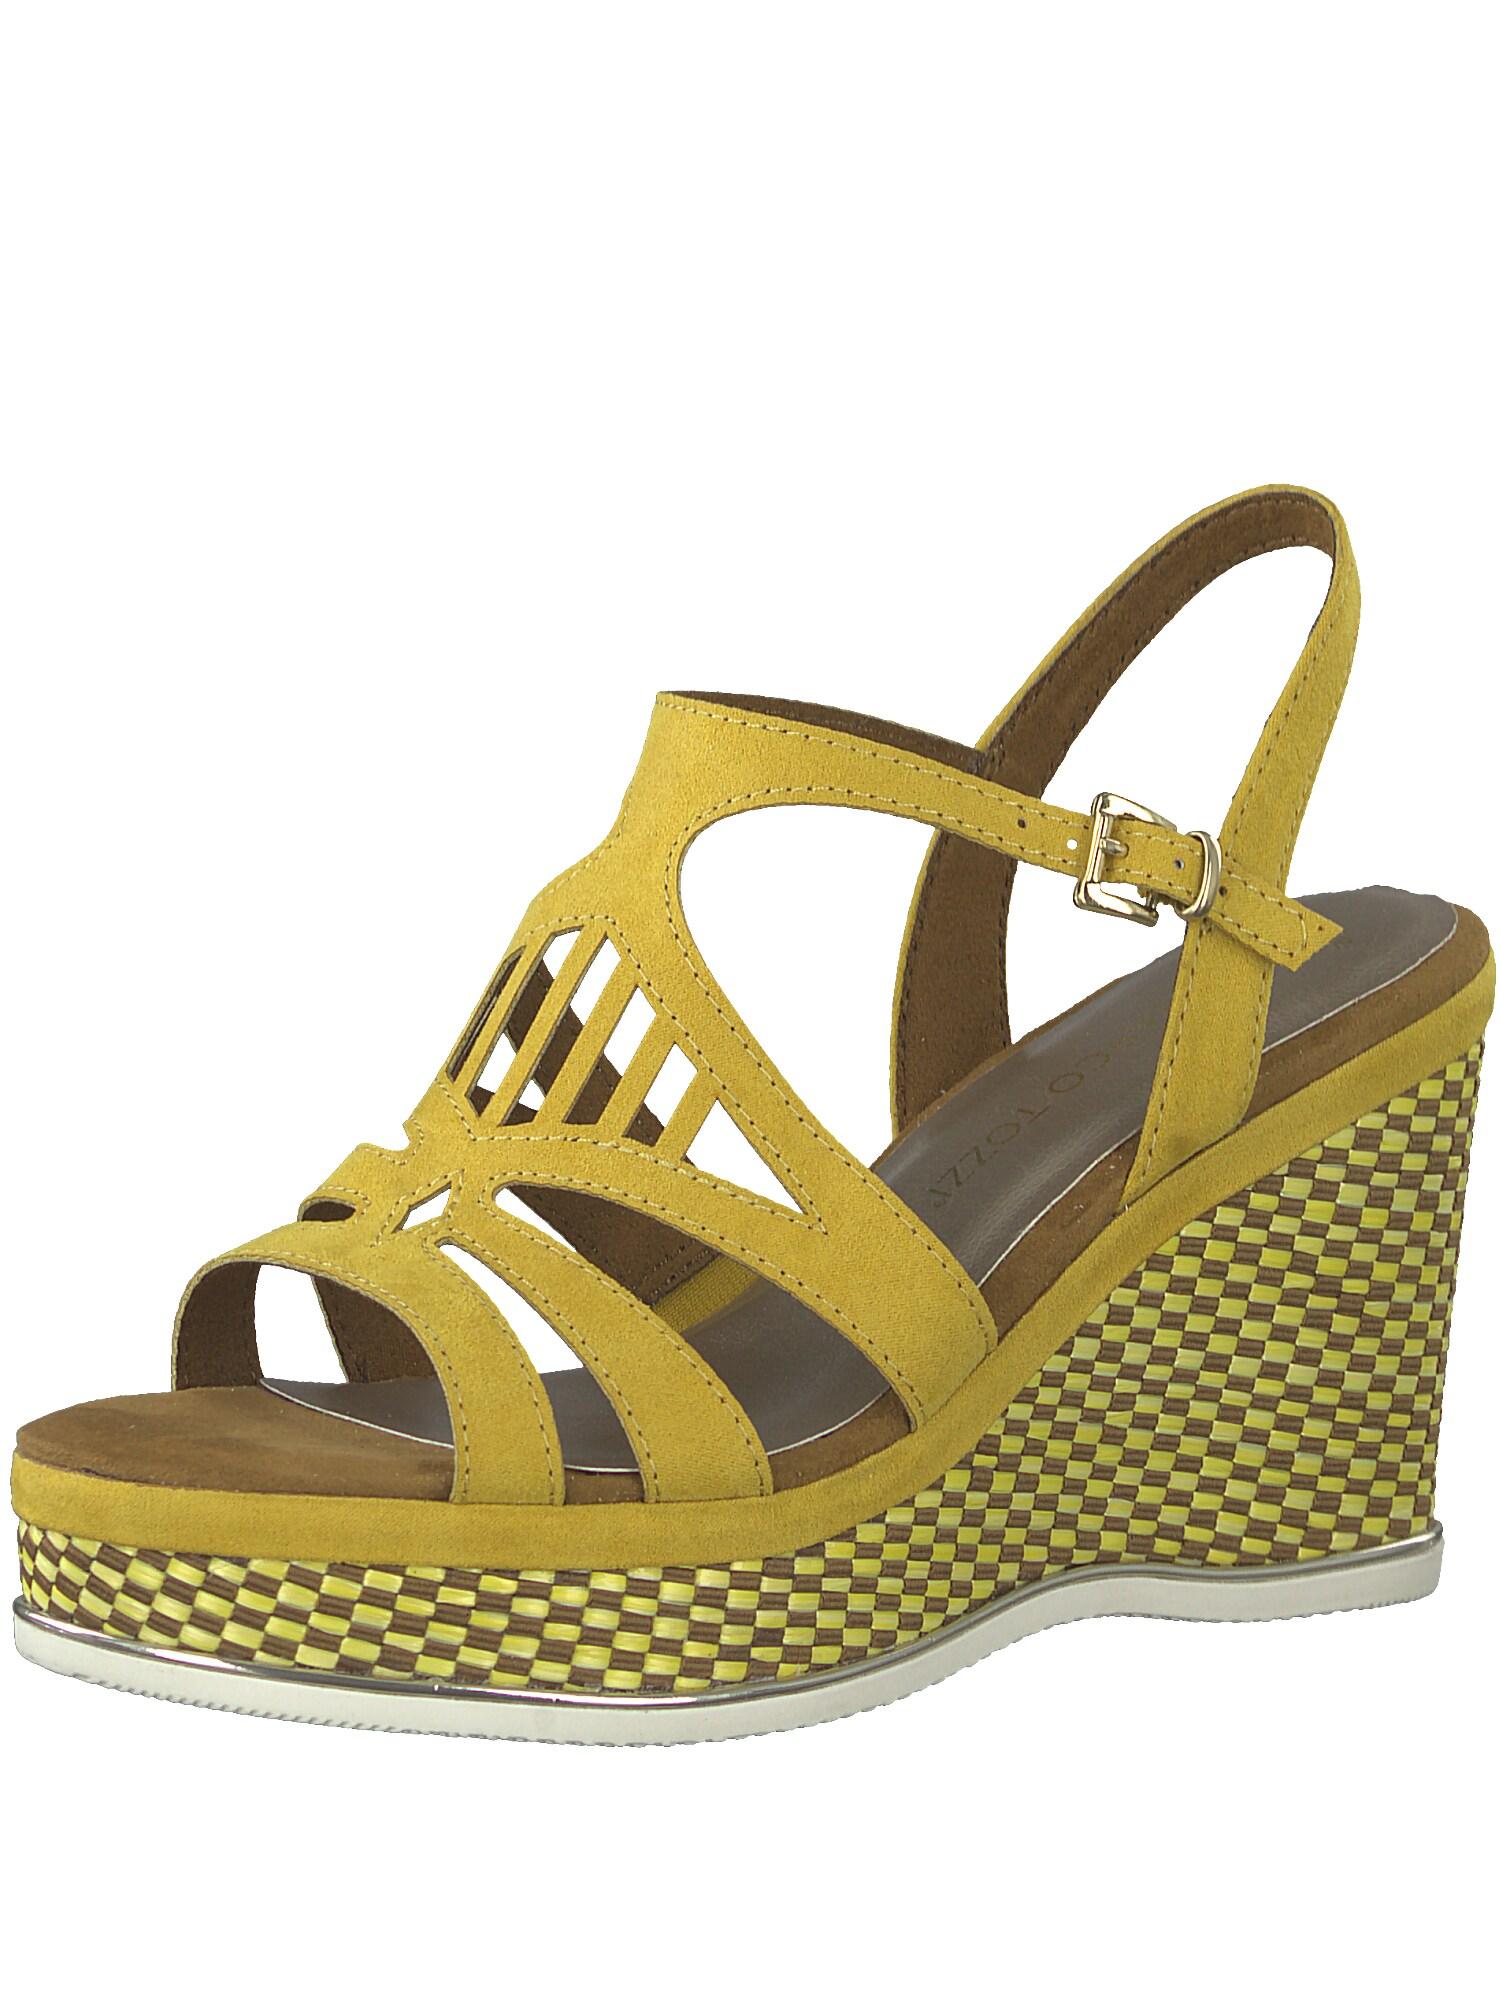 Sandály Wedge žlutá oranžová MARCO TOZZI